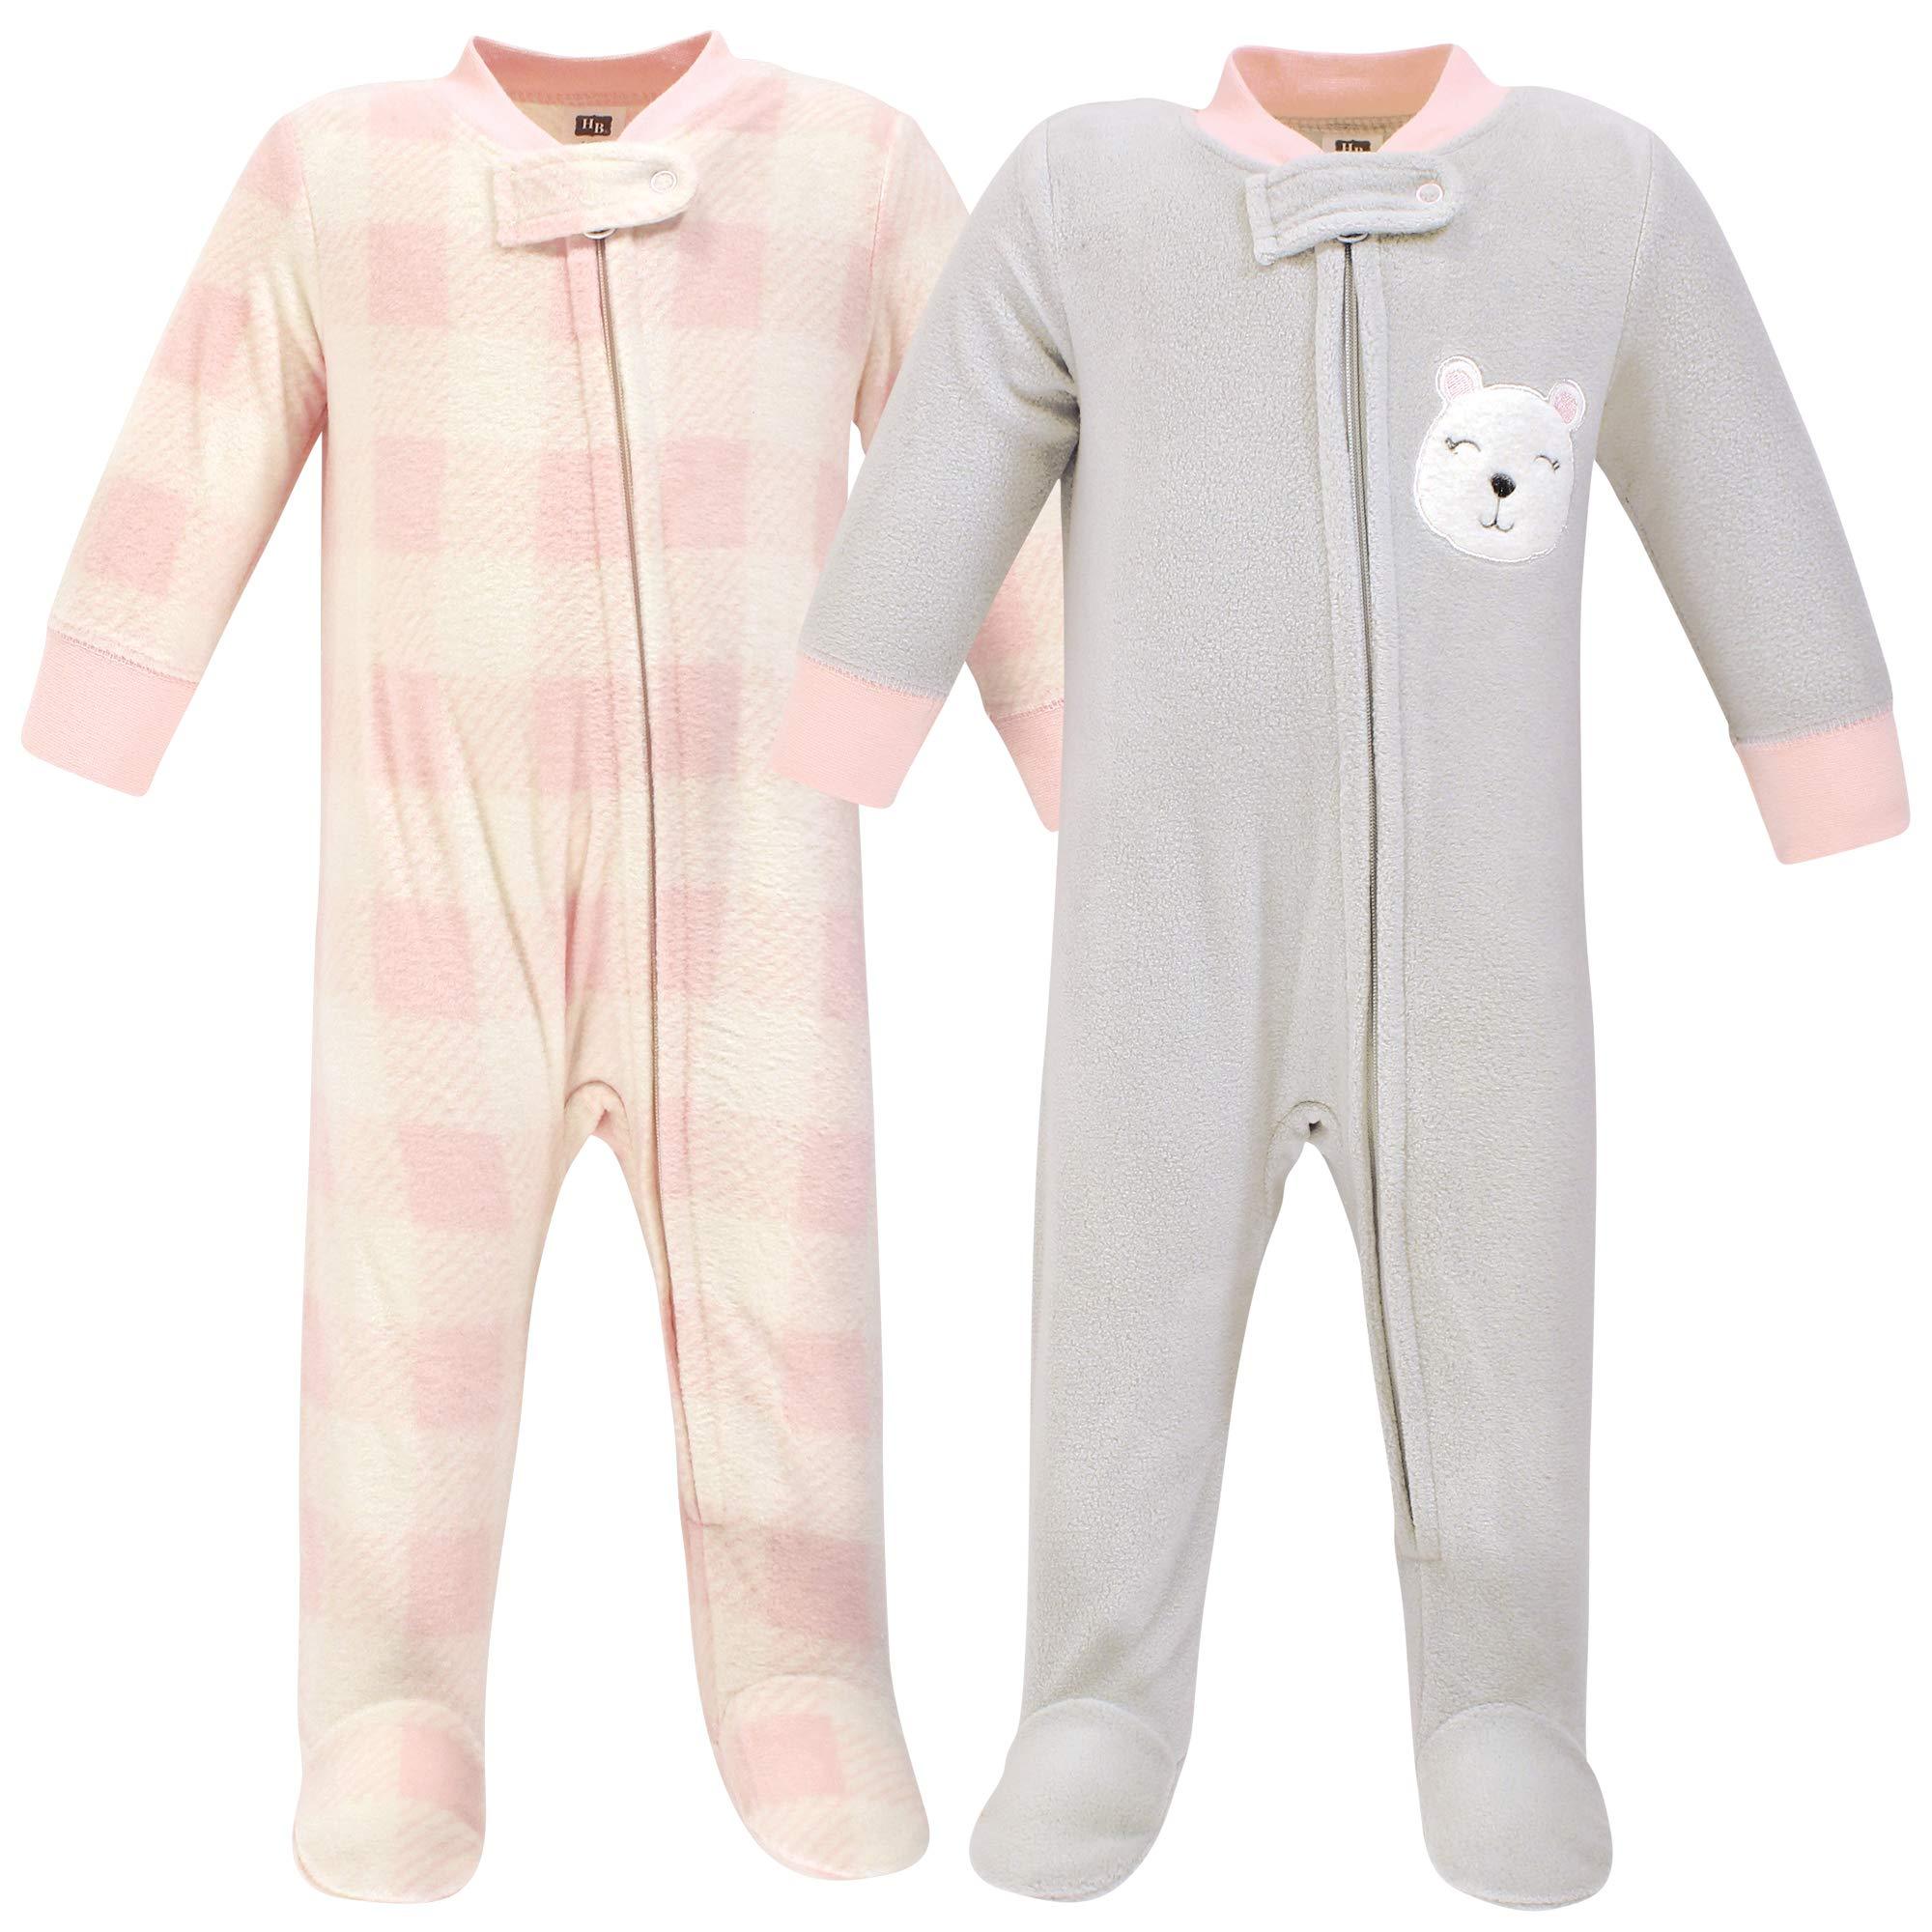 Hudson Baby Unisex Fleece Sleep and Play, Girl Baby Bear 2-Pack